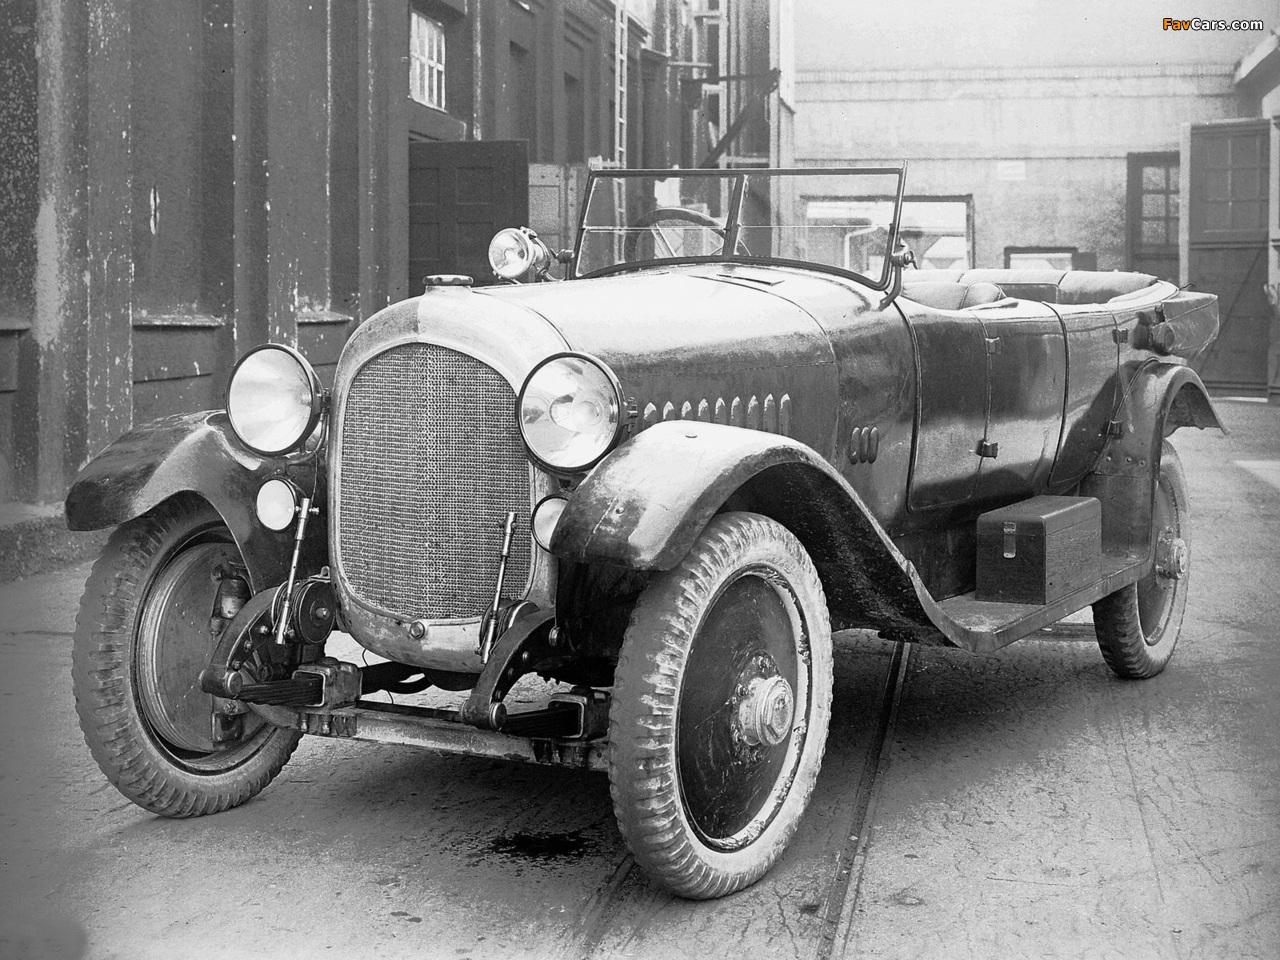 Maybach W1 Testwagen 1919 images (1280 x 960)